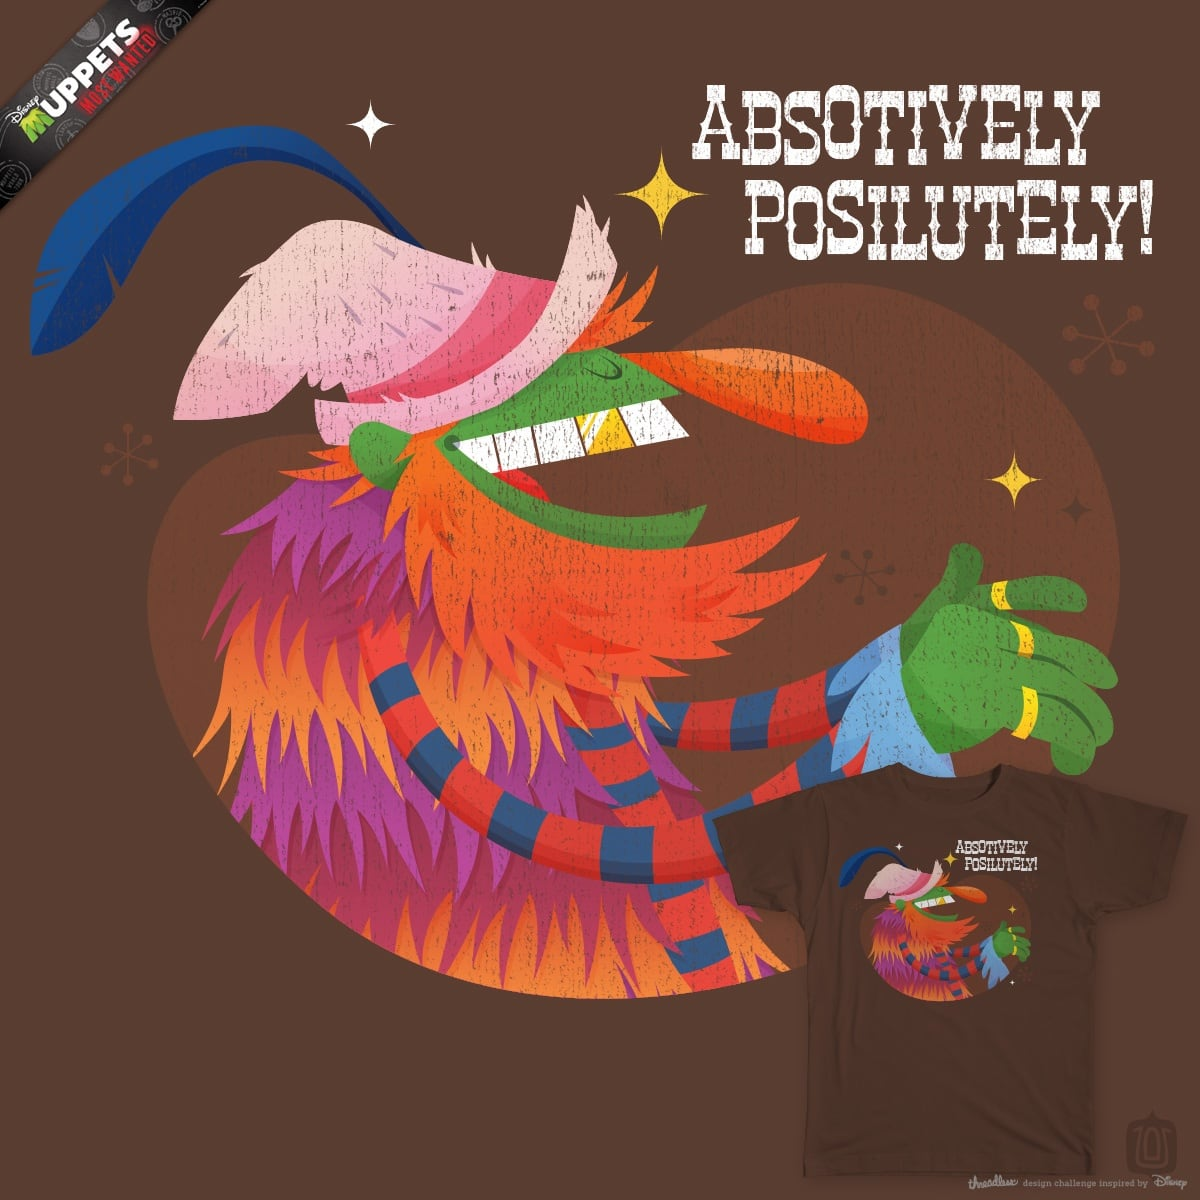 Absotively Posilutely by Stinkyham on Threadless